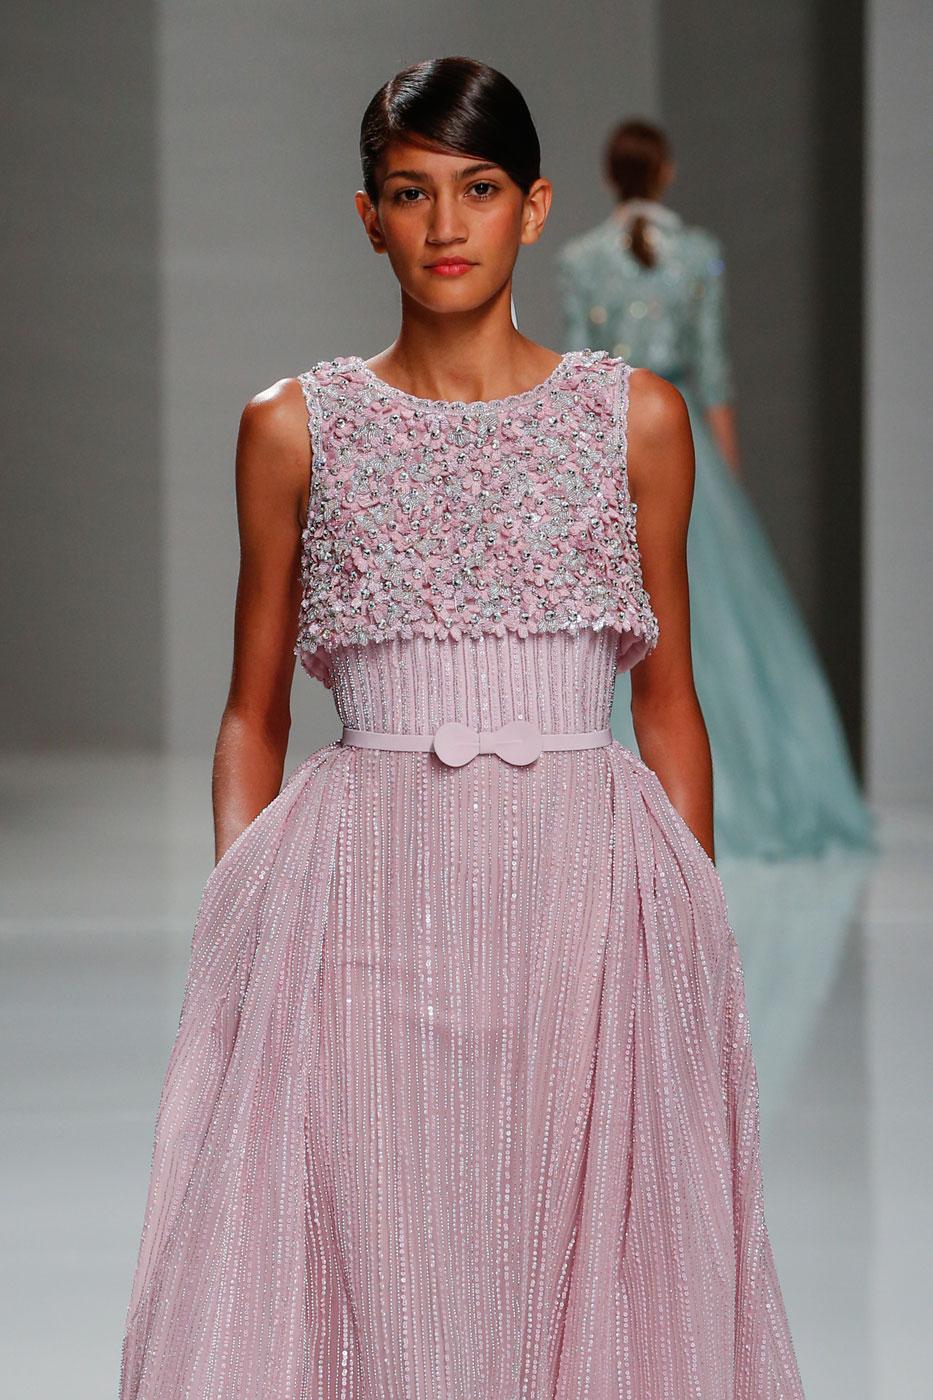 Georges-Hobeika-fashion-runway-show-haute-couture-paris-spring-2015-the-impression-22